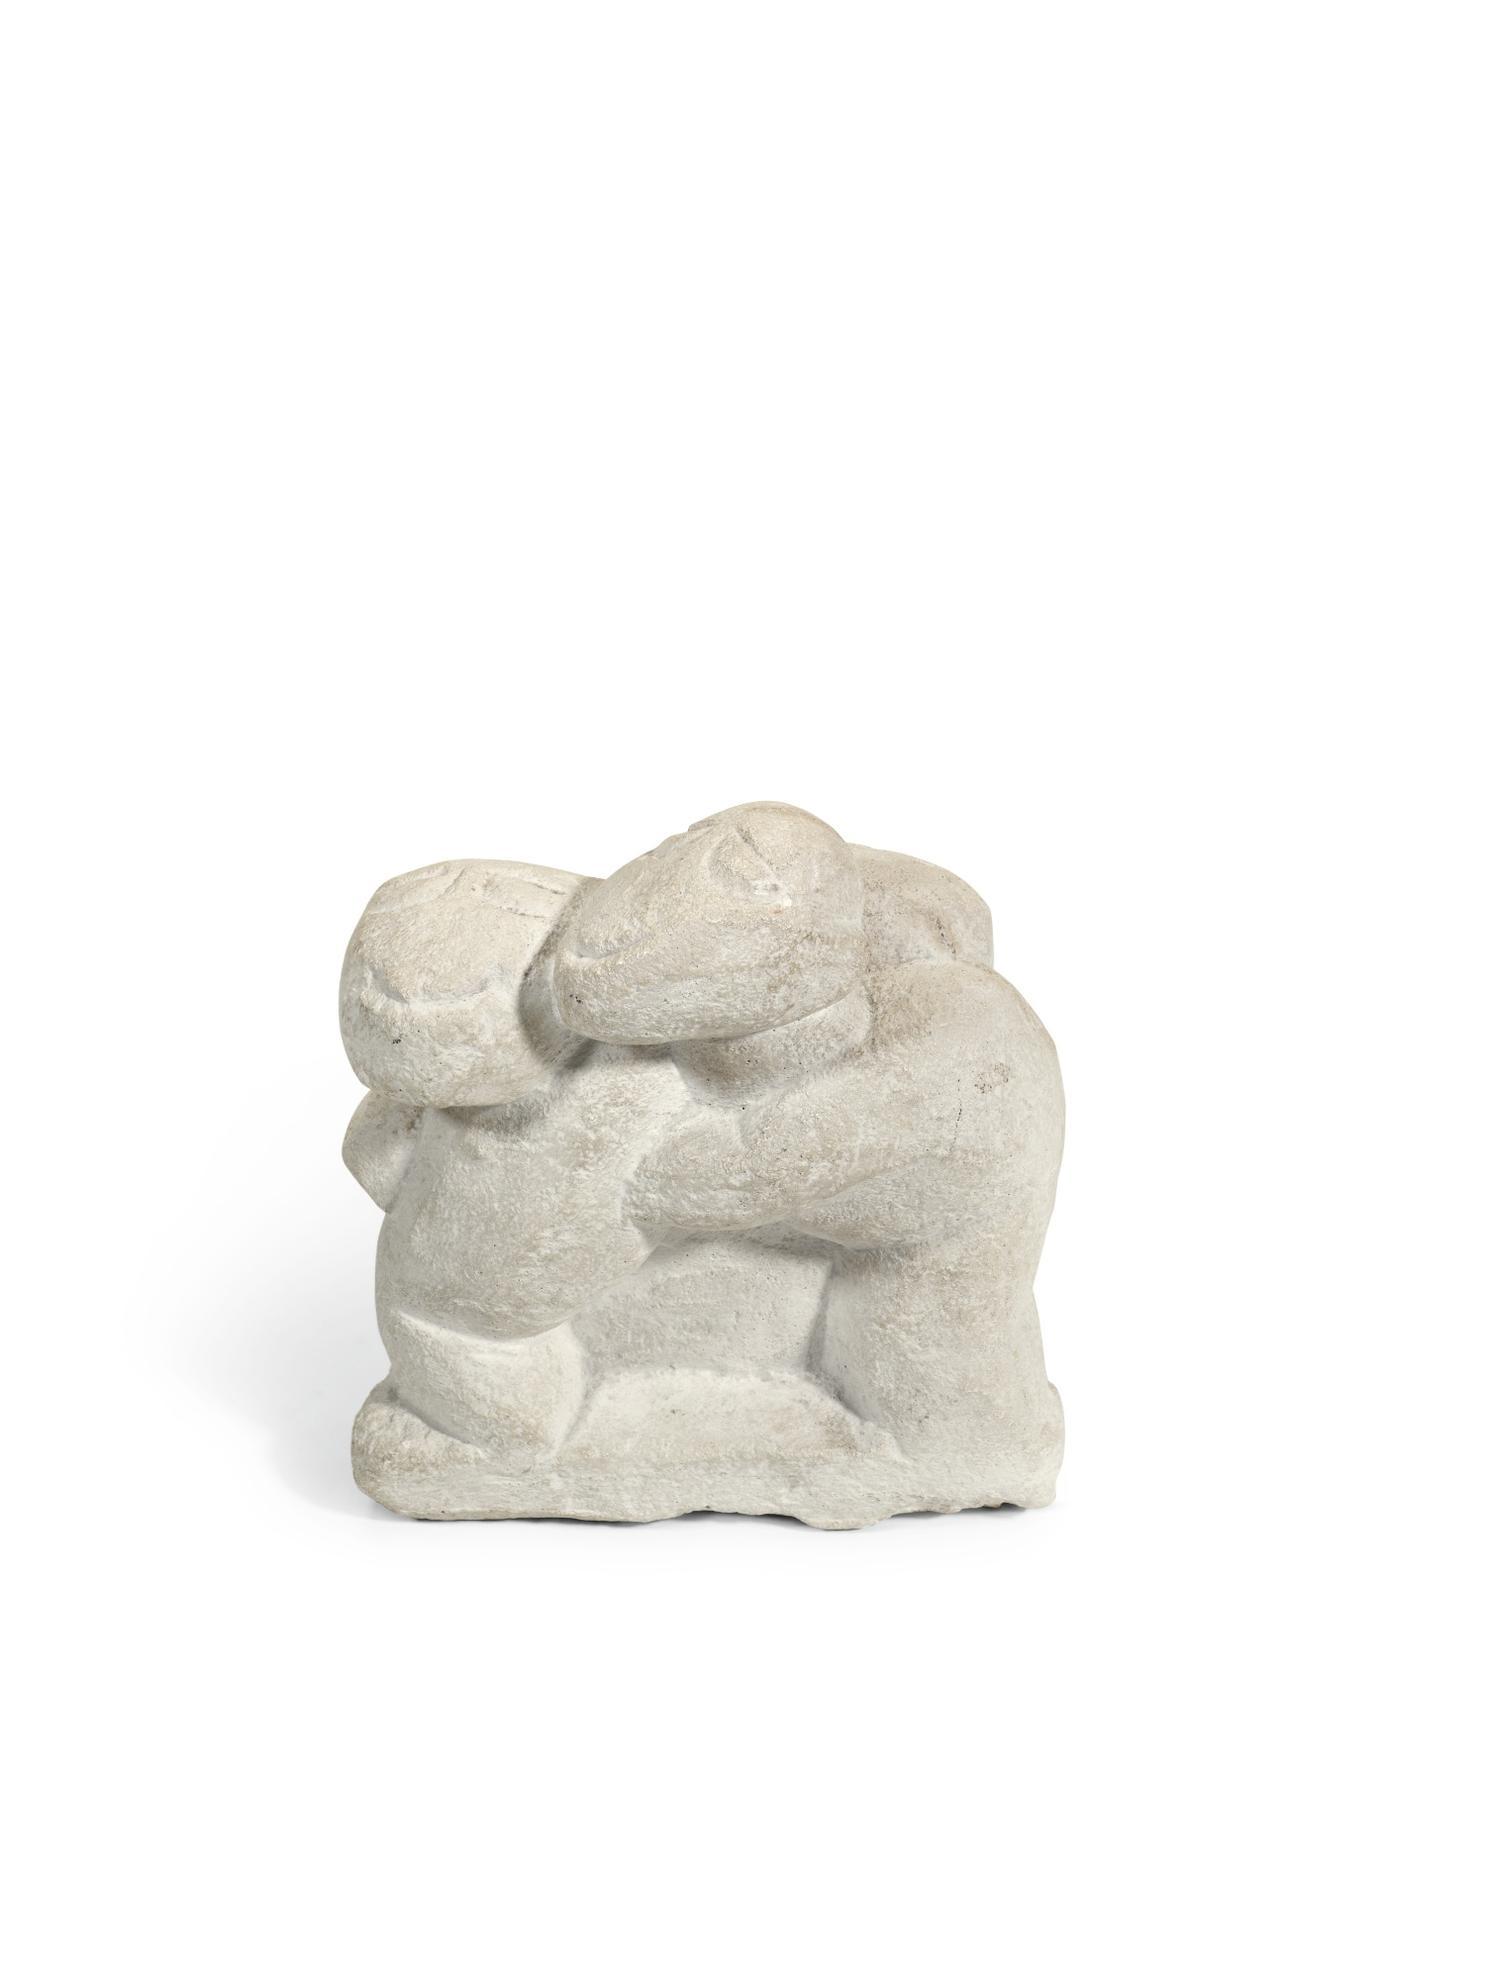 Henri Gaudier-Brzeska-Three Monkeys-1965